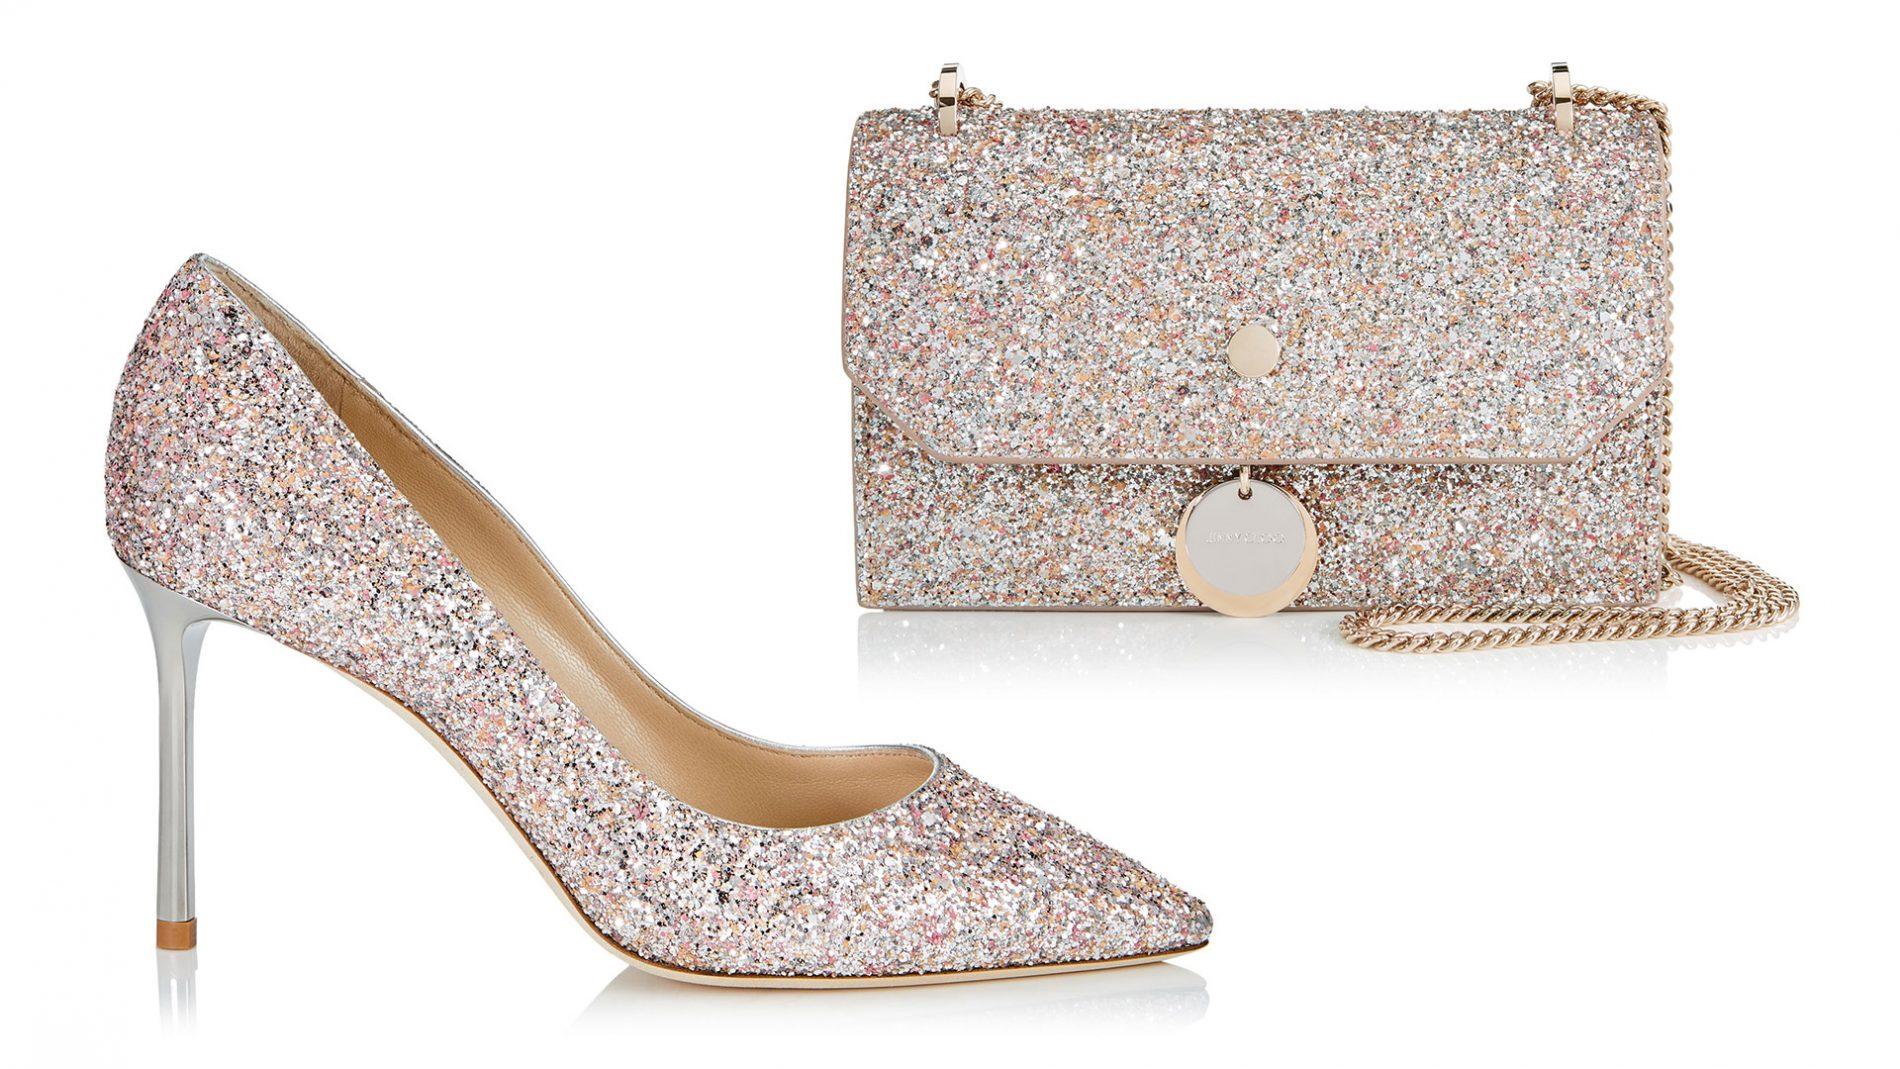 El Corte Inglés Golden Week Designer Shoes Handbags Jimmy Choo